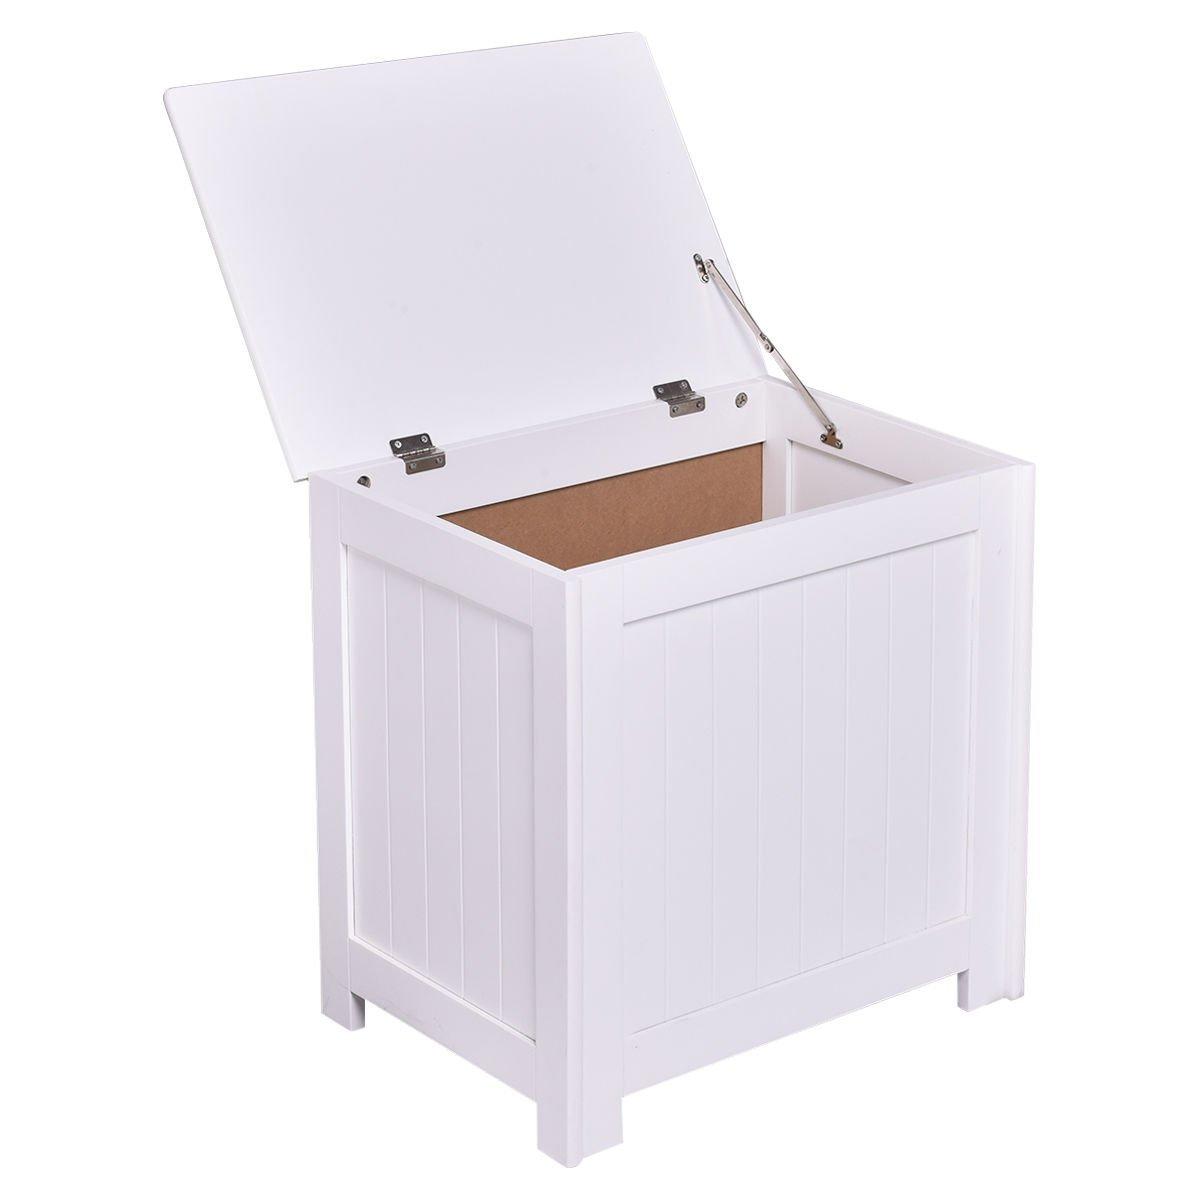 Get Quotations Fdinspiration 20 5 White Mdf Wood Laundry Hamper Storage Organizer W Flip Lid